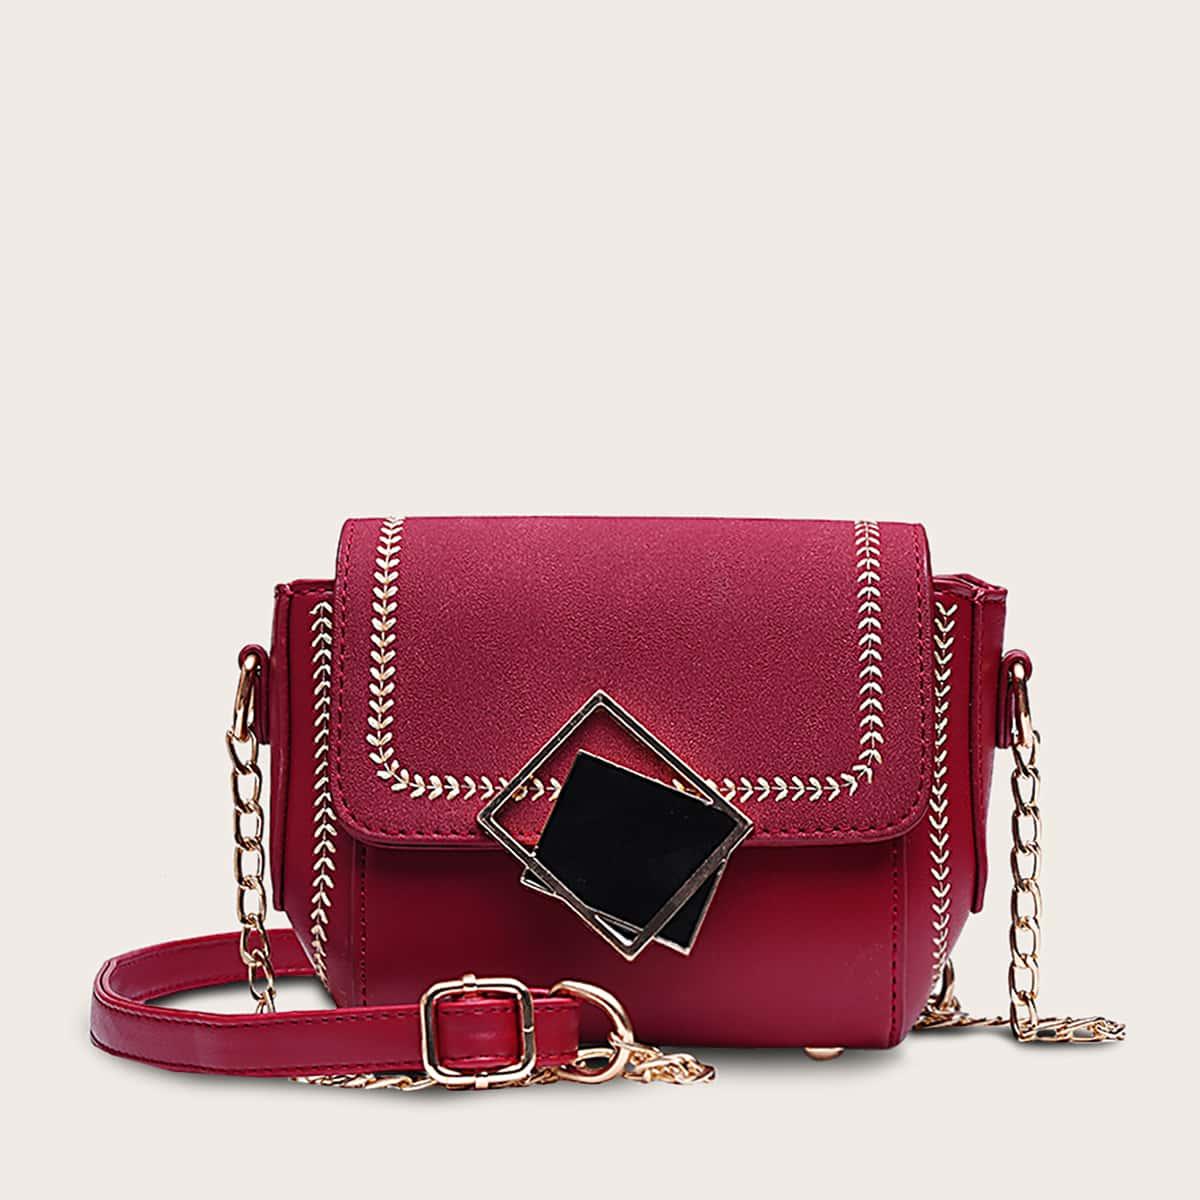 Naht Detail Flap Crossbody Bag